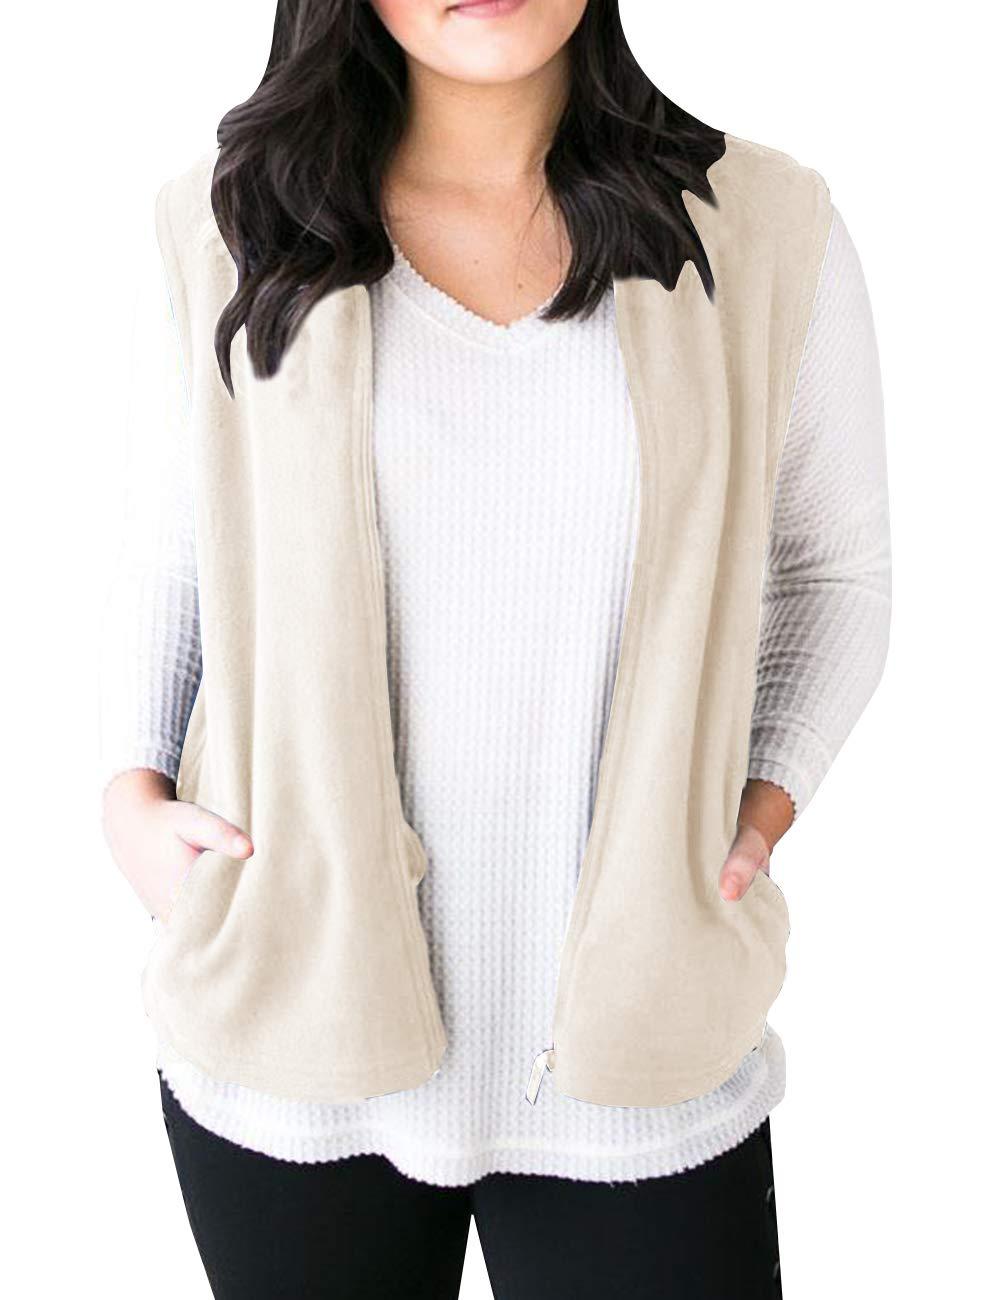 Saodimallsu Womens Open Front Sleeveless Cardigan Sweater Zip up Fleece Vest Outwear with Pockets